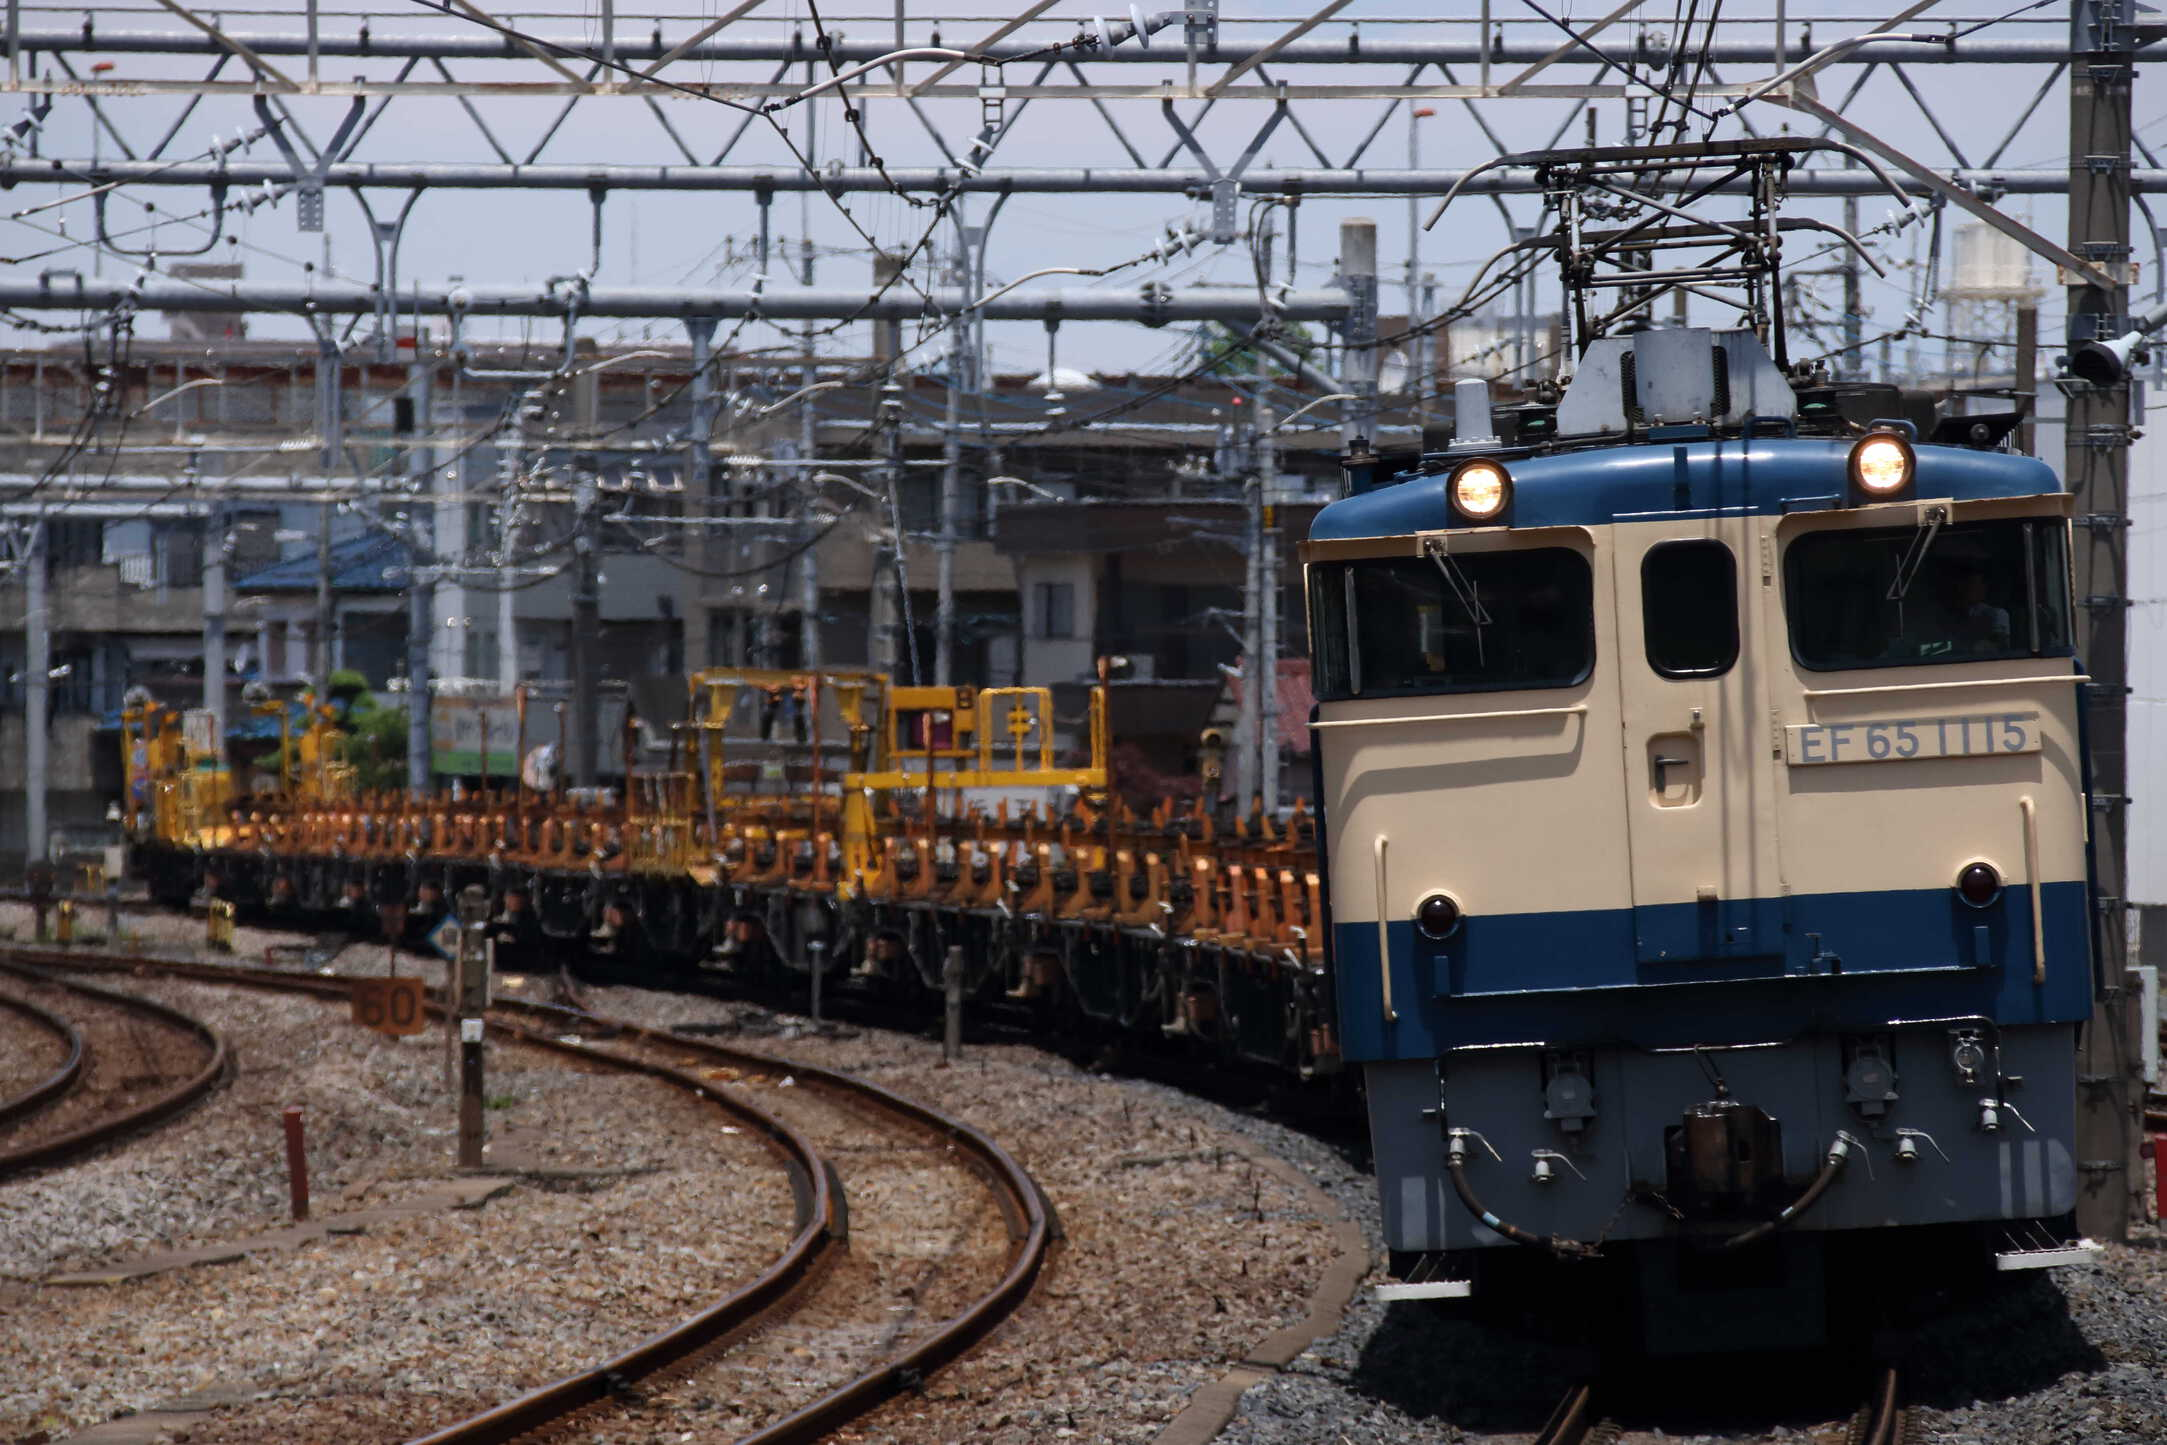 工9774列車 新津工臨返空(新南=3) EF65-1115②[田]+ロンチキB編成13両